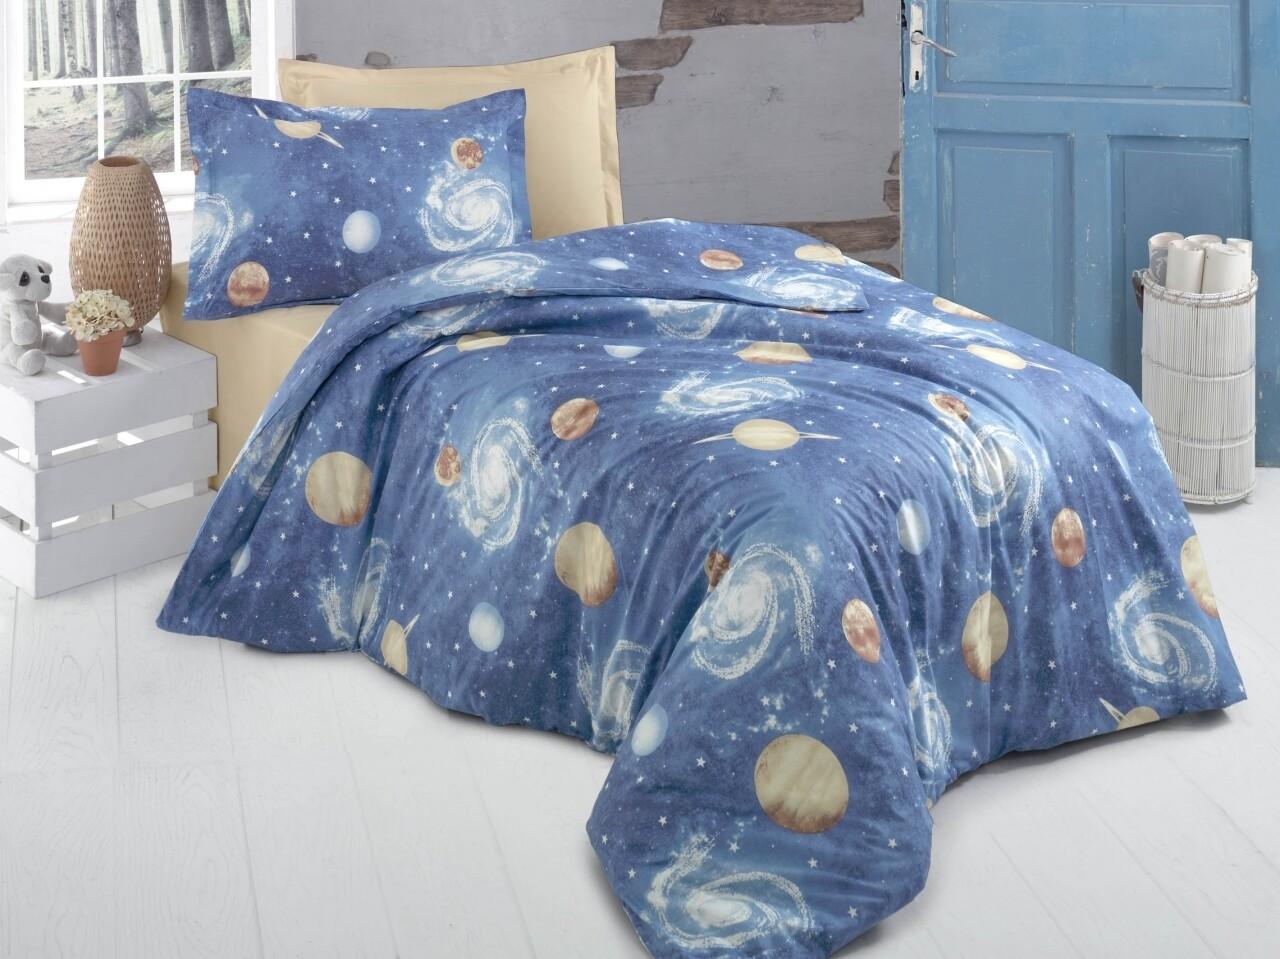 Lenjerie de pat pentru doua persoane, Galaxie Bedora, 100%  bumbac, 6 piese